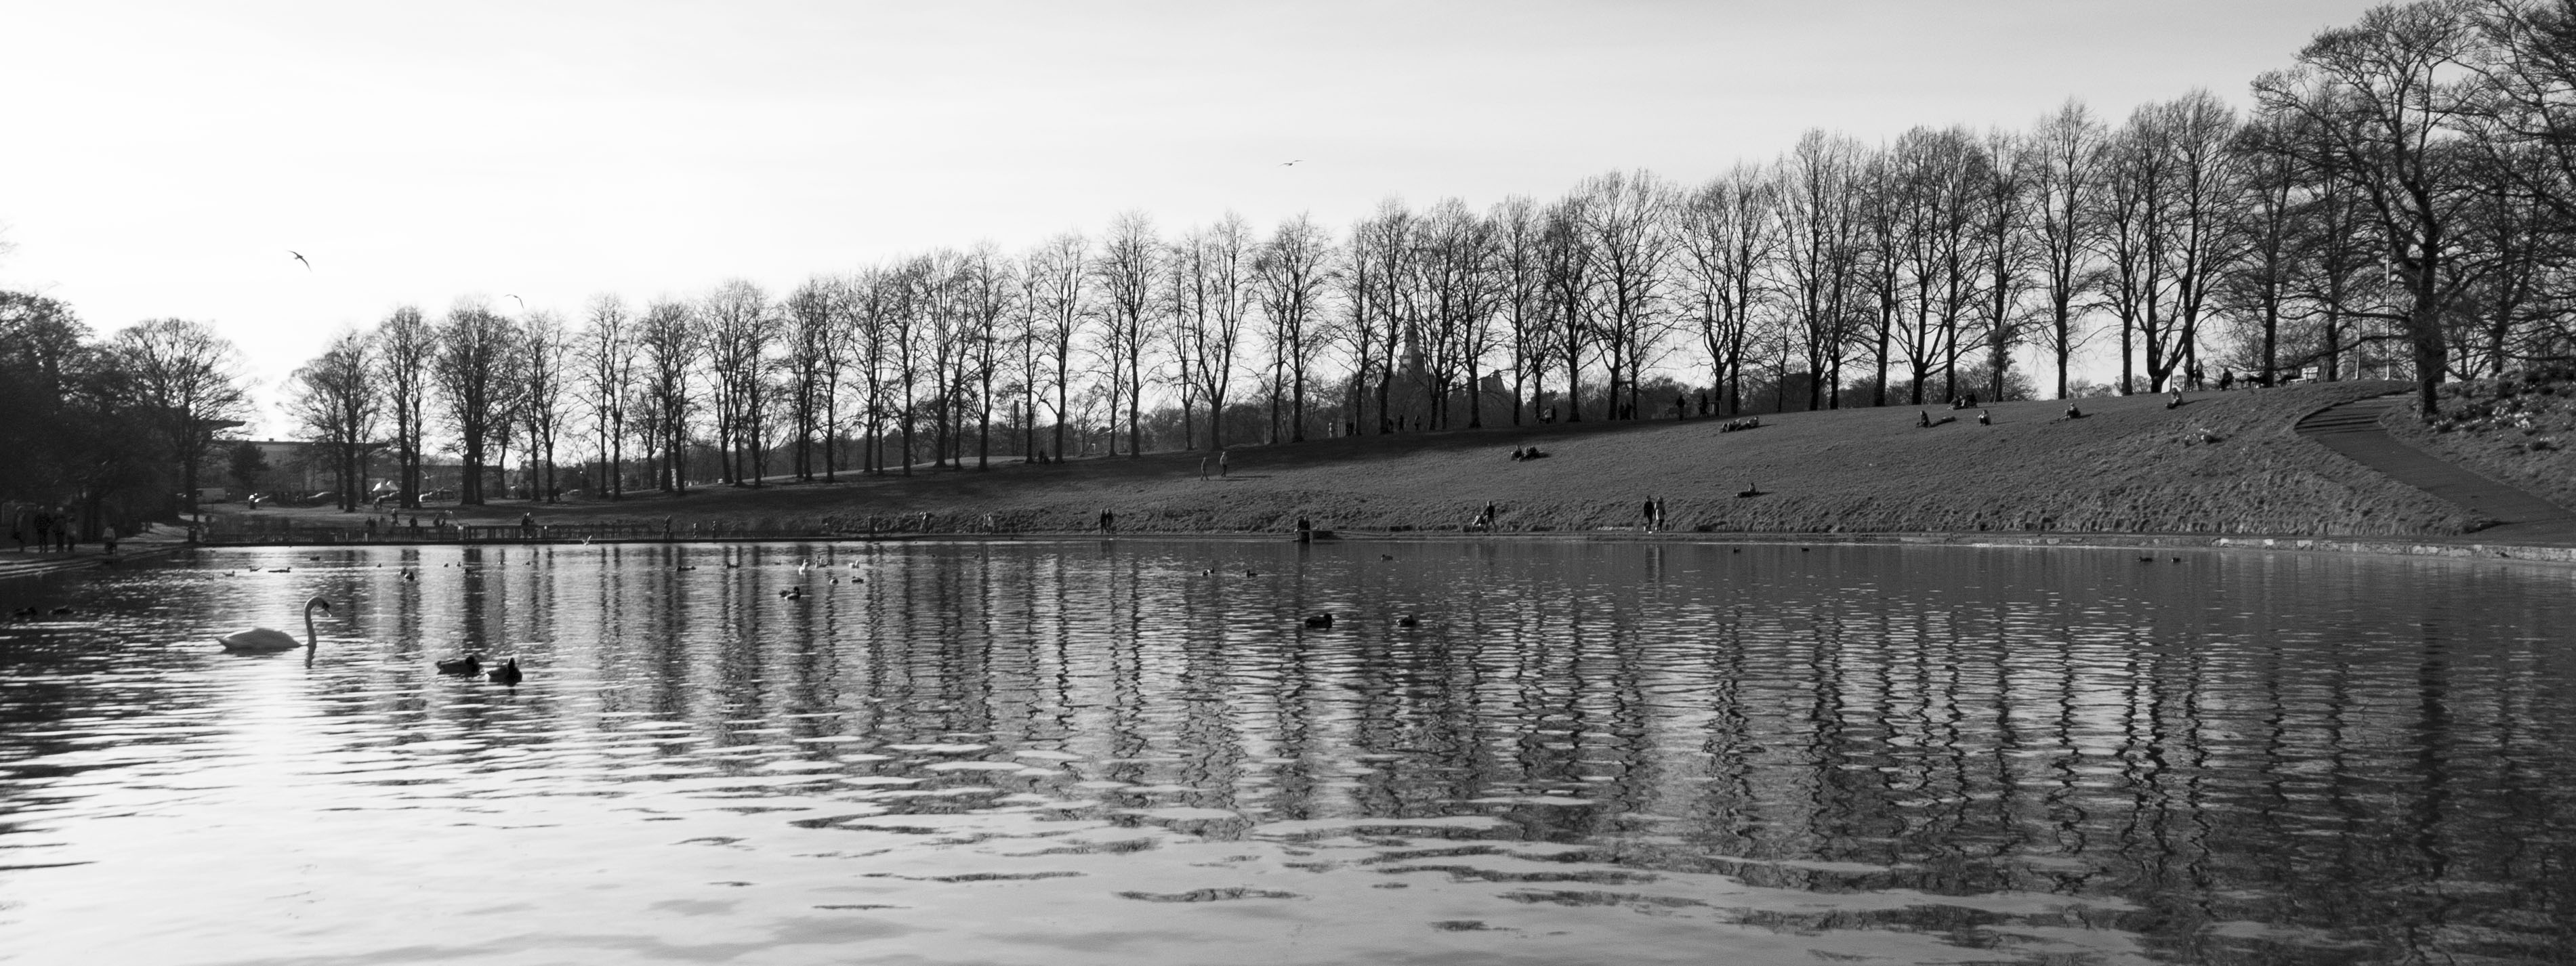 Inverleith Park, Edinburgh - 3006